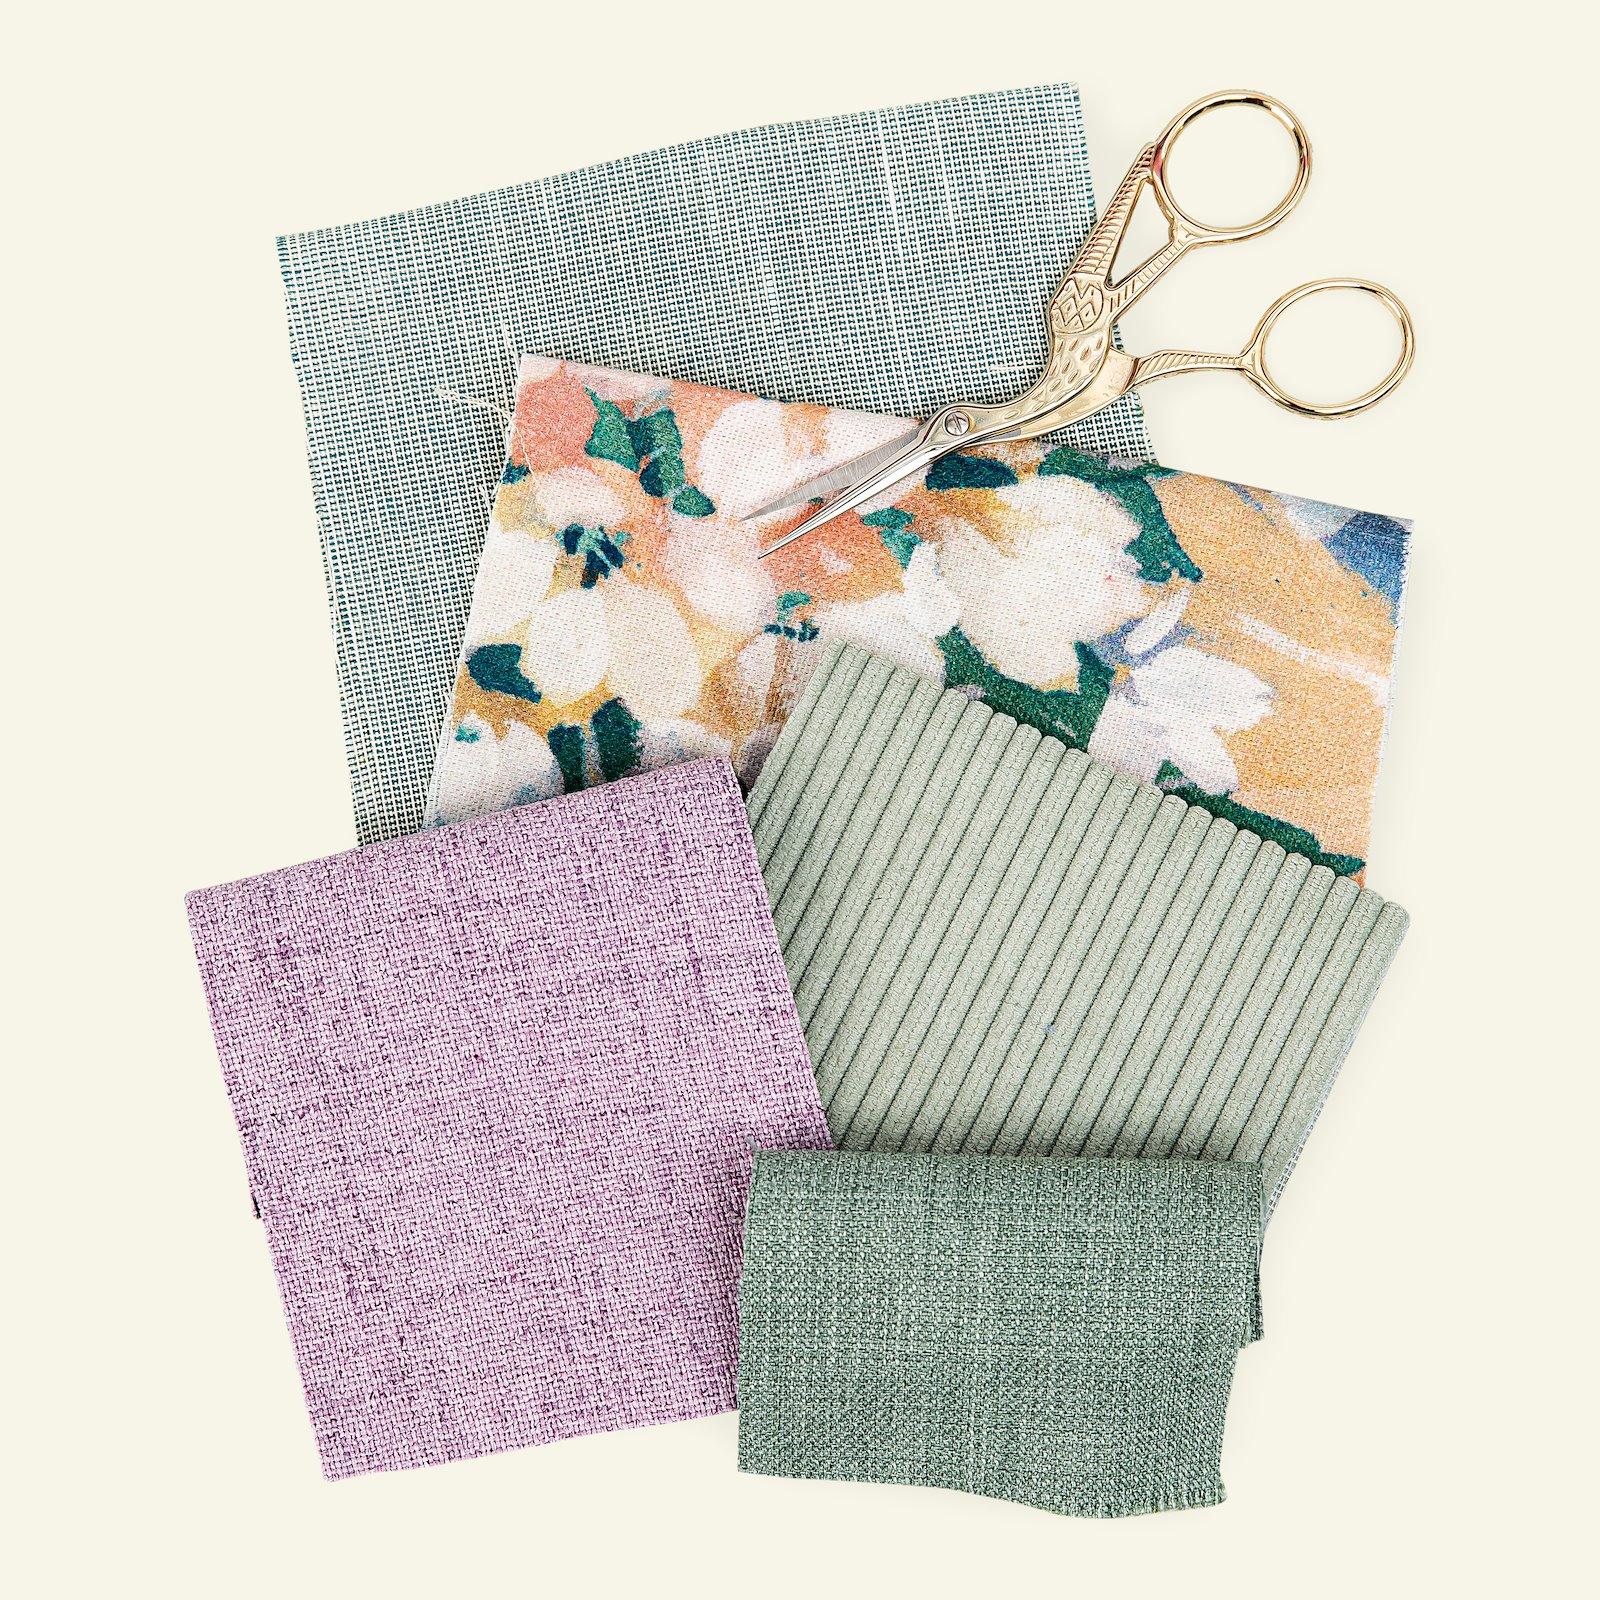 Upholstery fabric dusty green melange 812636_824051_823993_824035_750443_42028_sskit